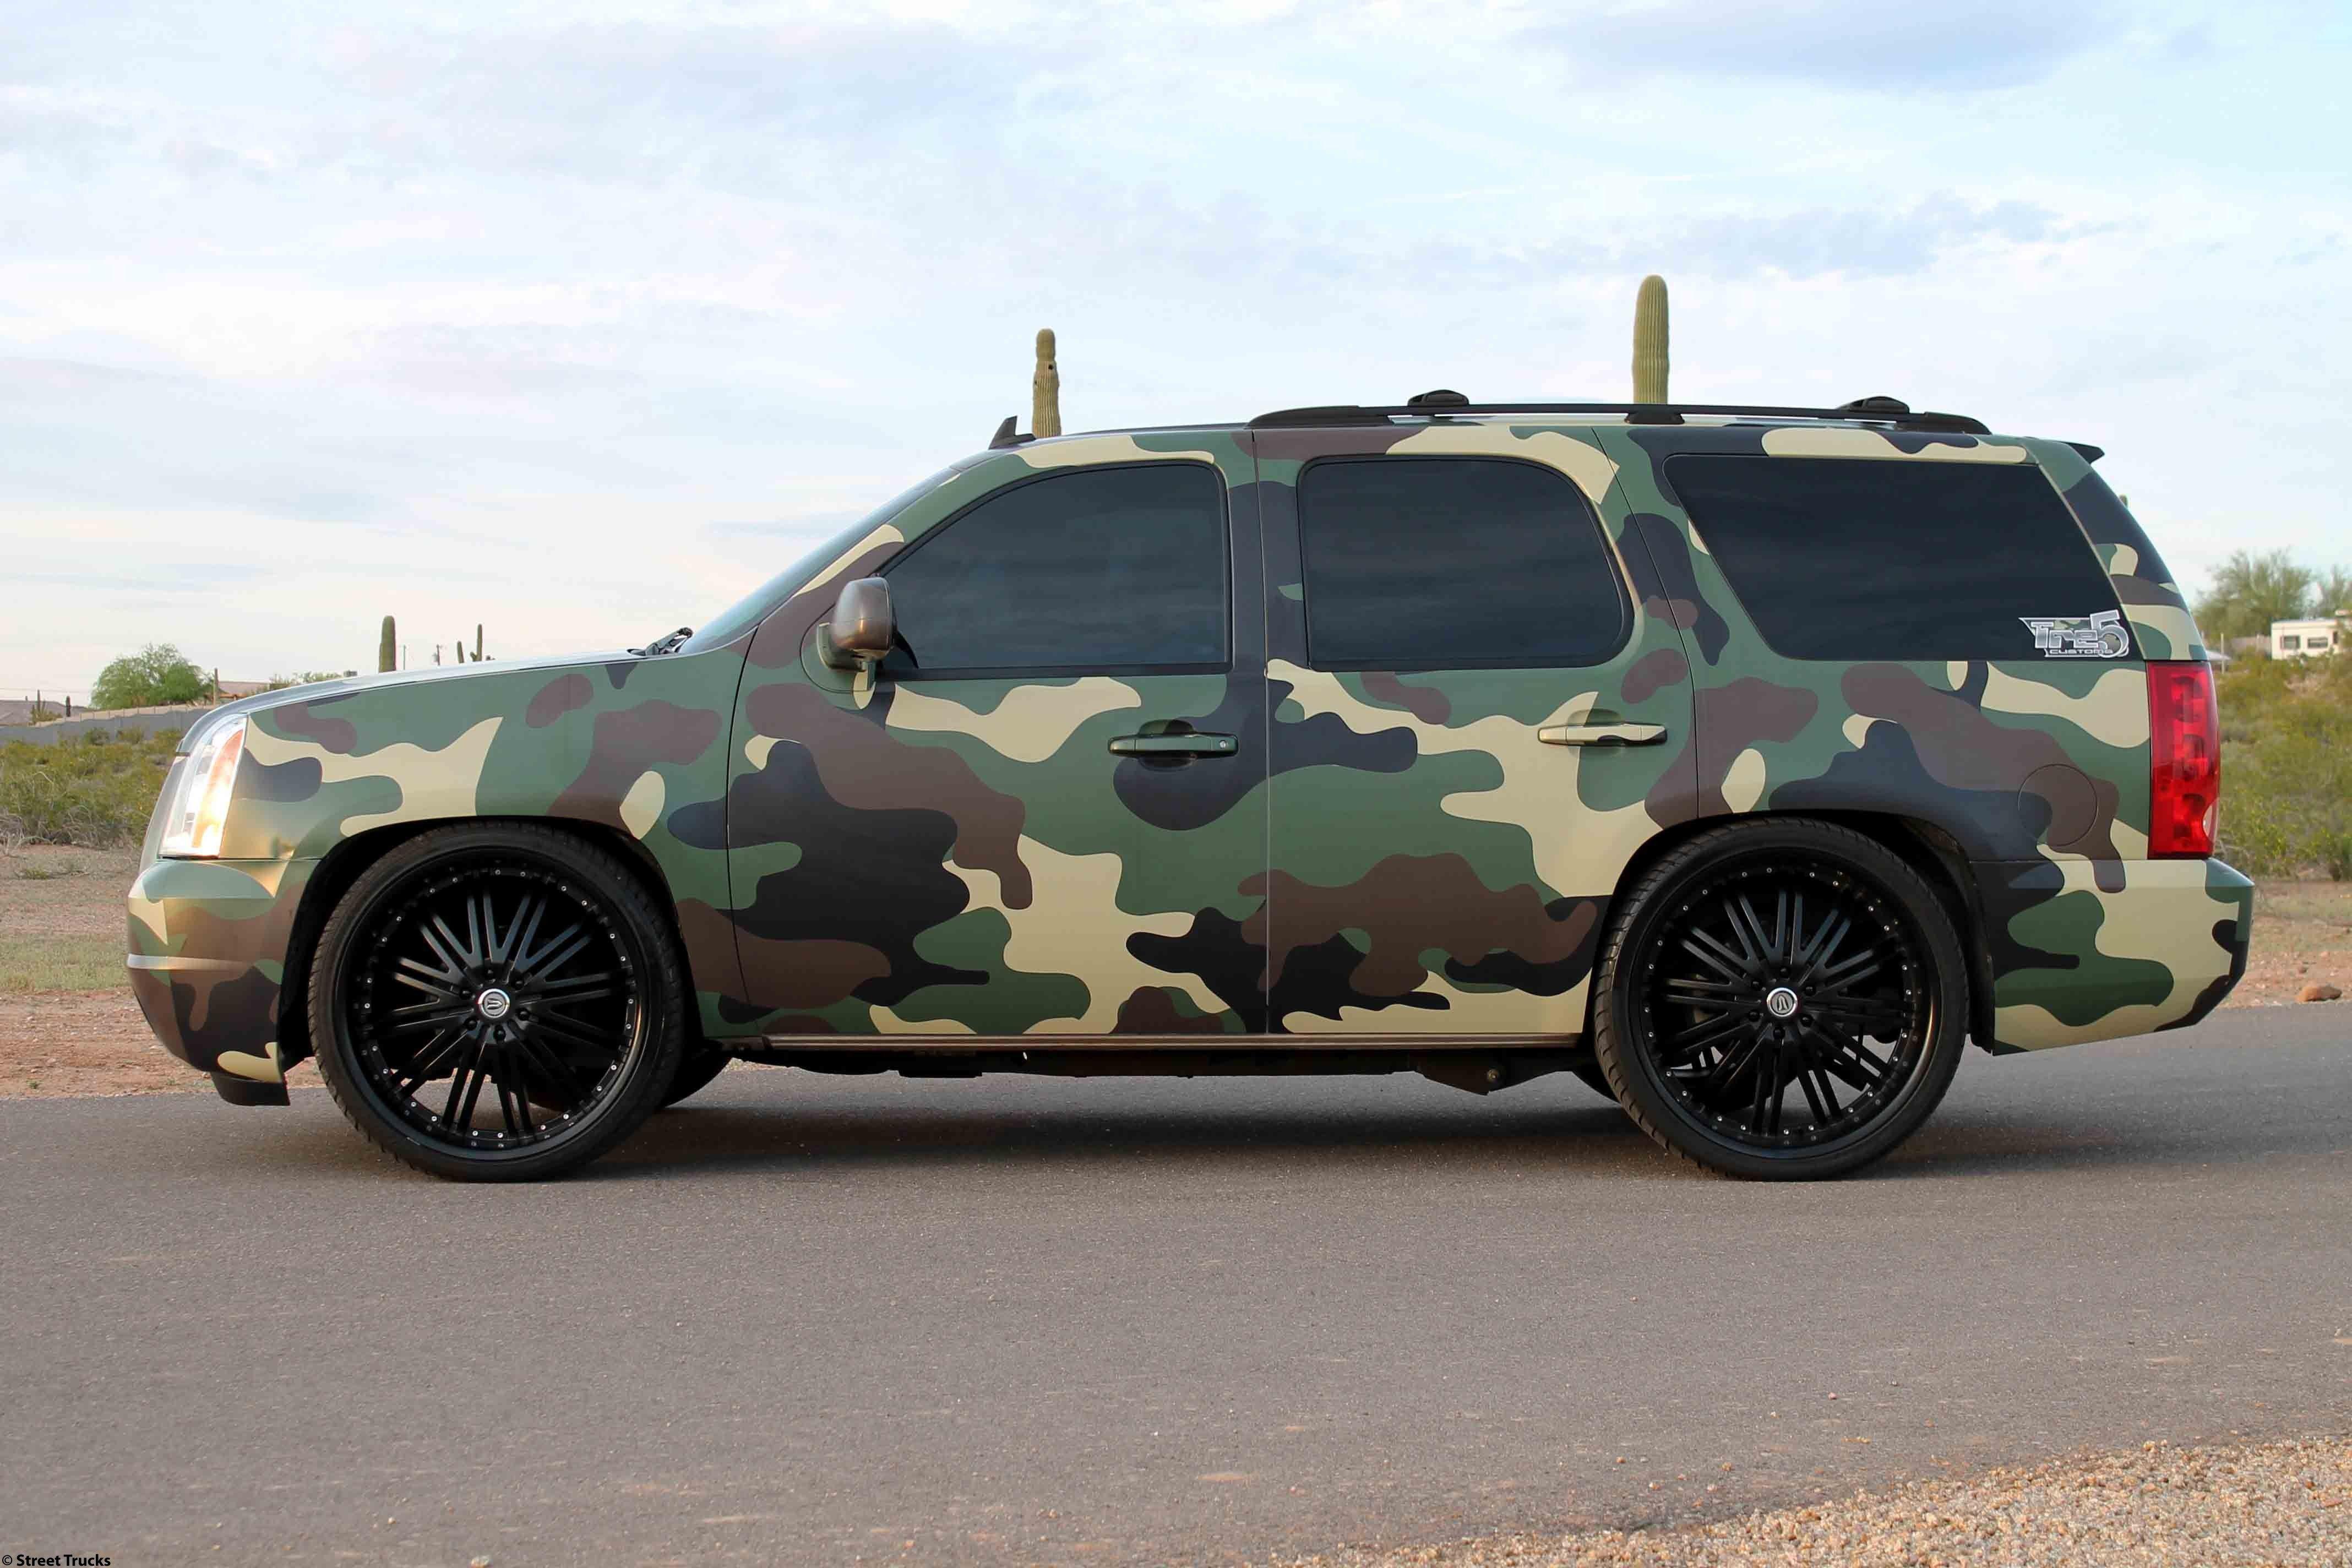 3m Vinyl Wrap For Sale >> 3m Vinyl Wraps Street Trucks Camo Truck Car Wrap Dream Car Garage